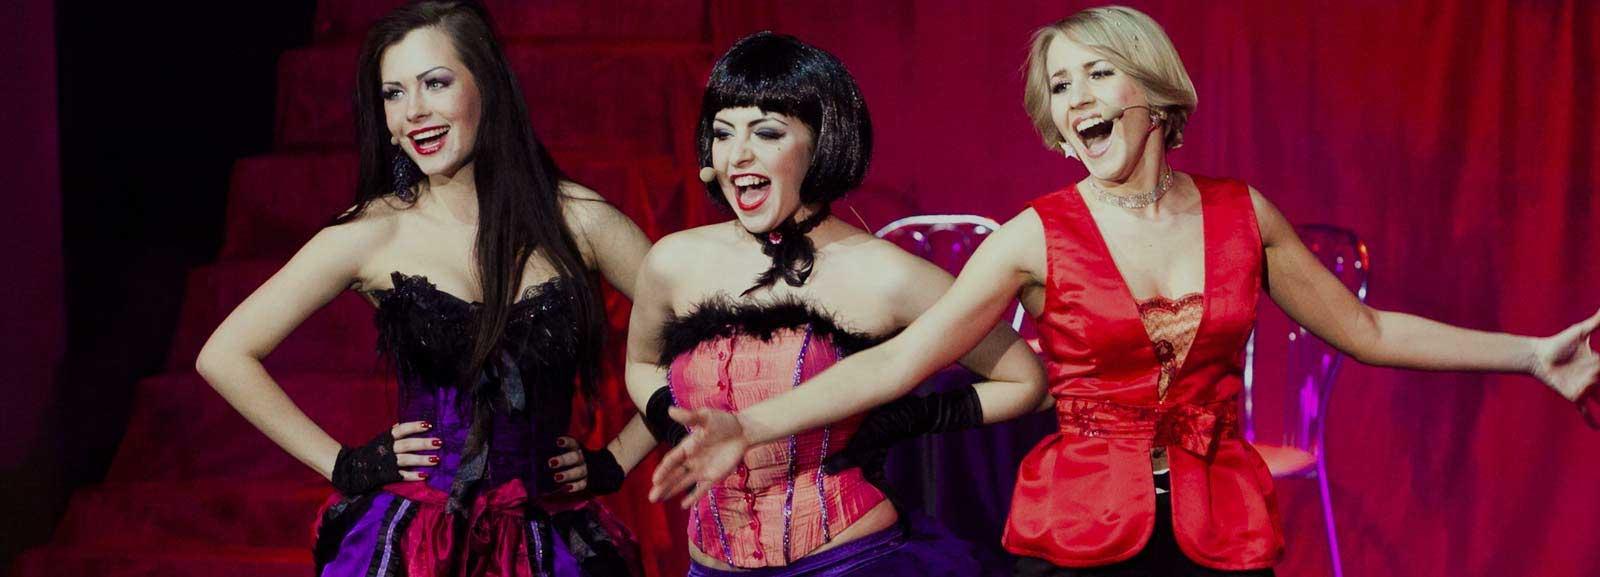 Burlesque2